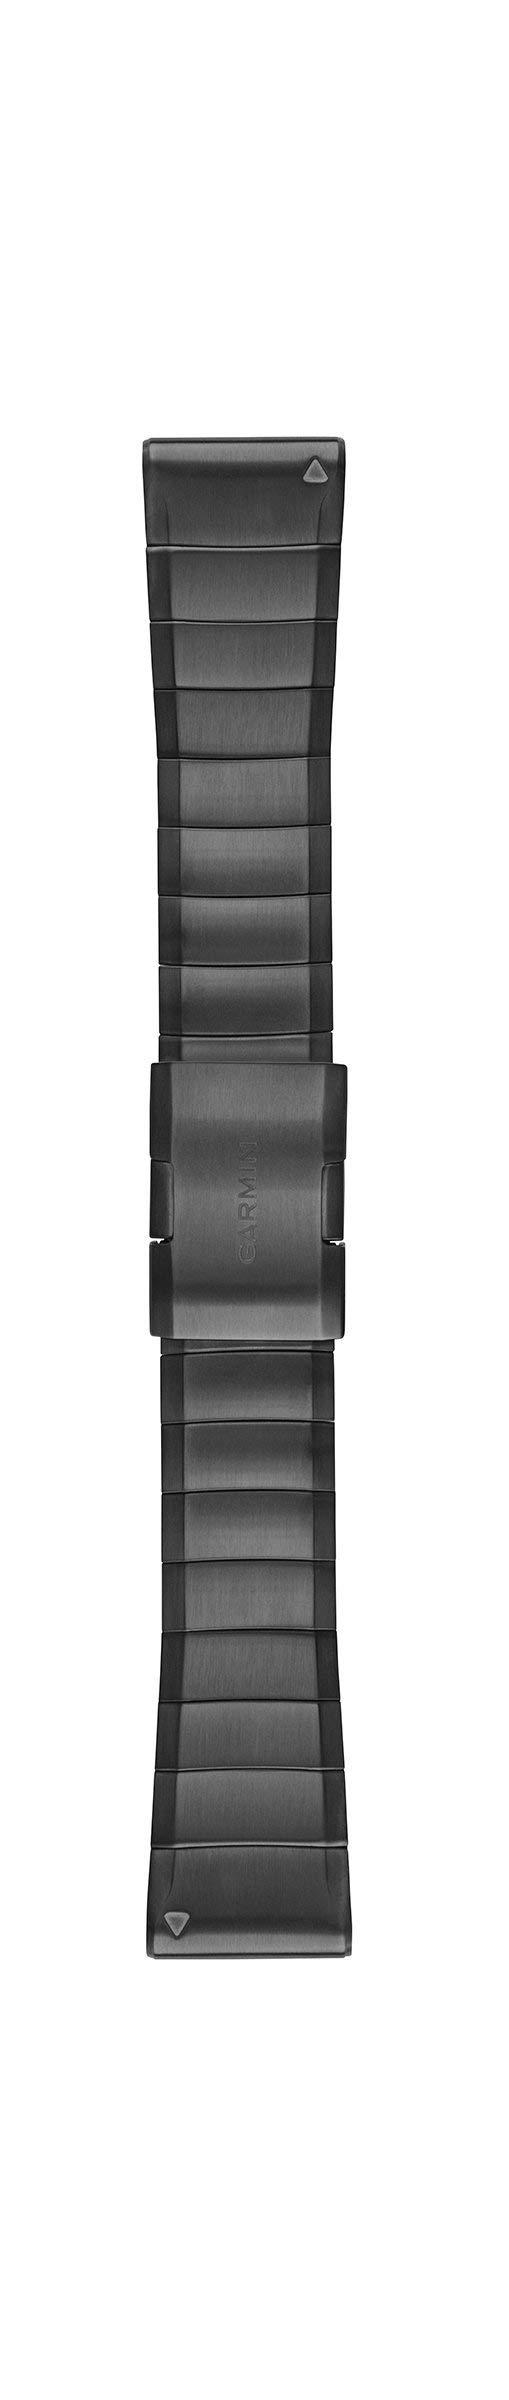 Garmin 010-12741-01 Quickfit 26 Watch Band - Carbon Grey DLC Titanium- Accessory Band for Fenix 5X Plus/Fenix 5X by Garmin (Image #1)